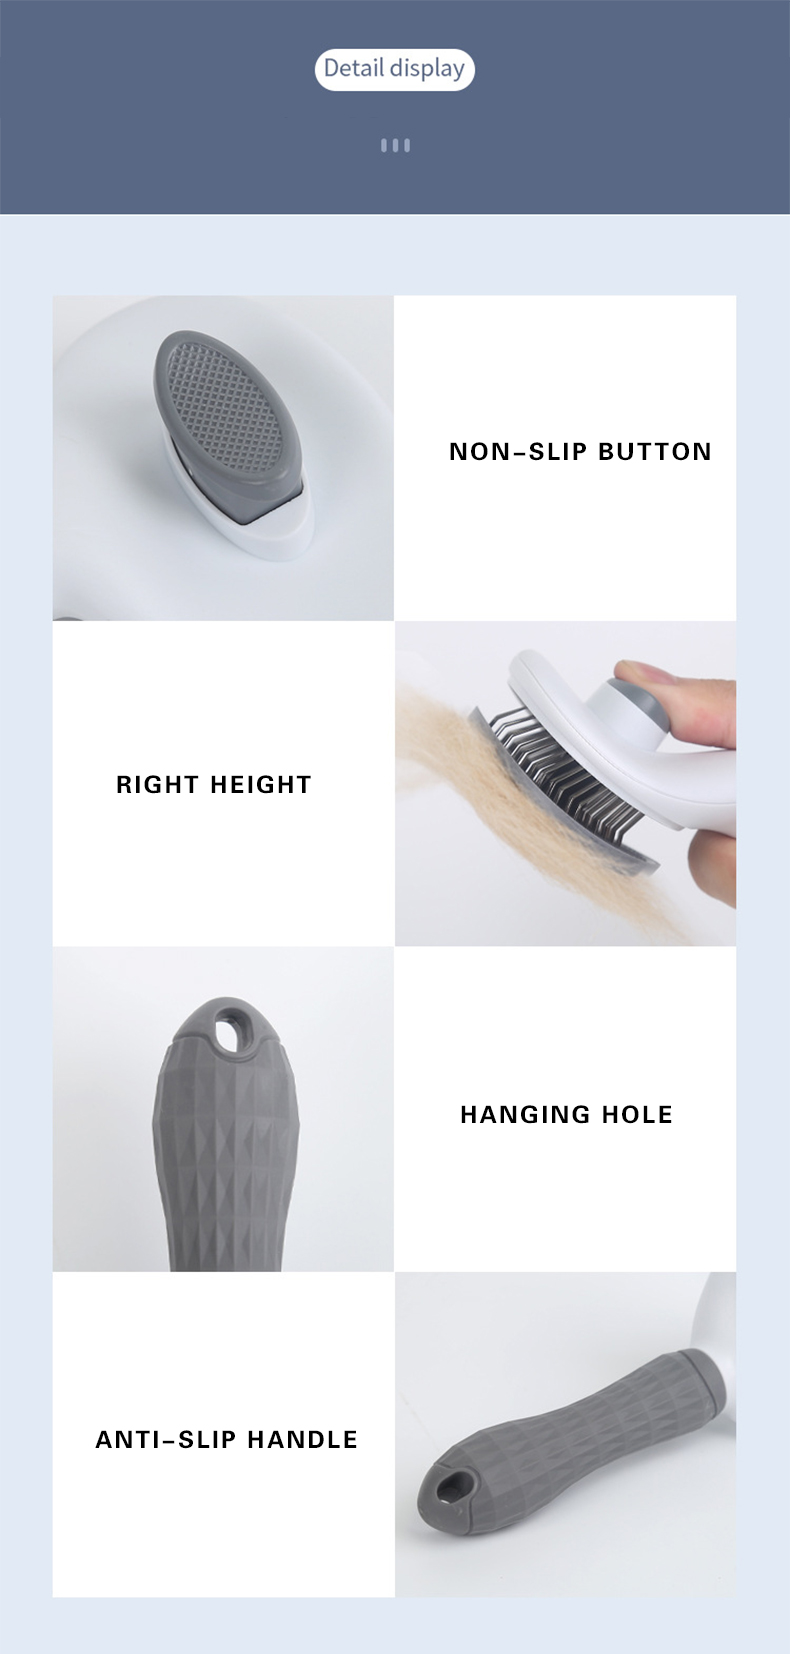 Hair Removal Non-slip Brush Image